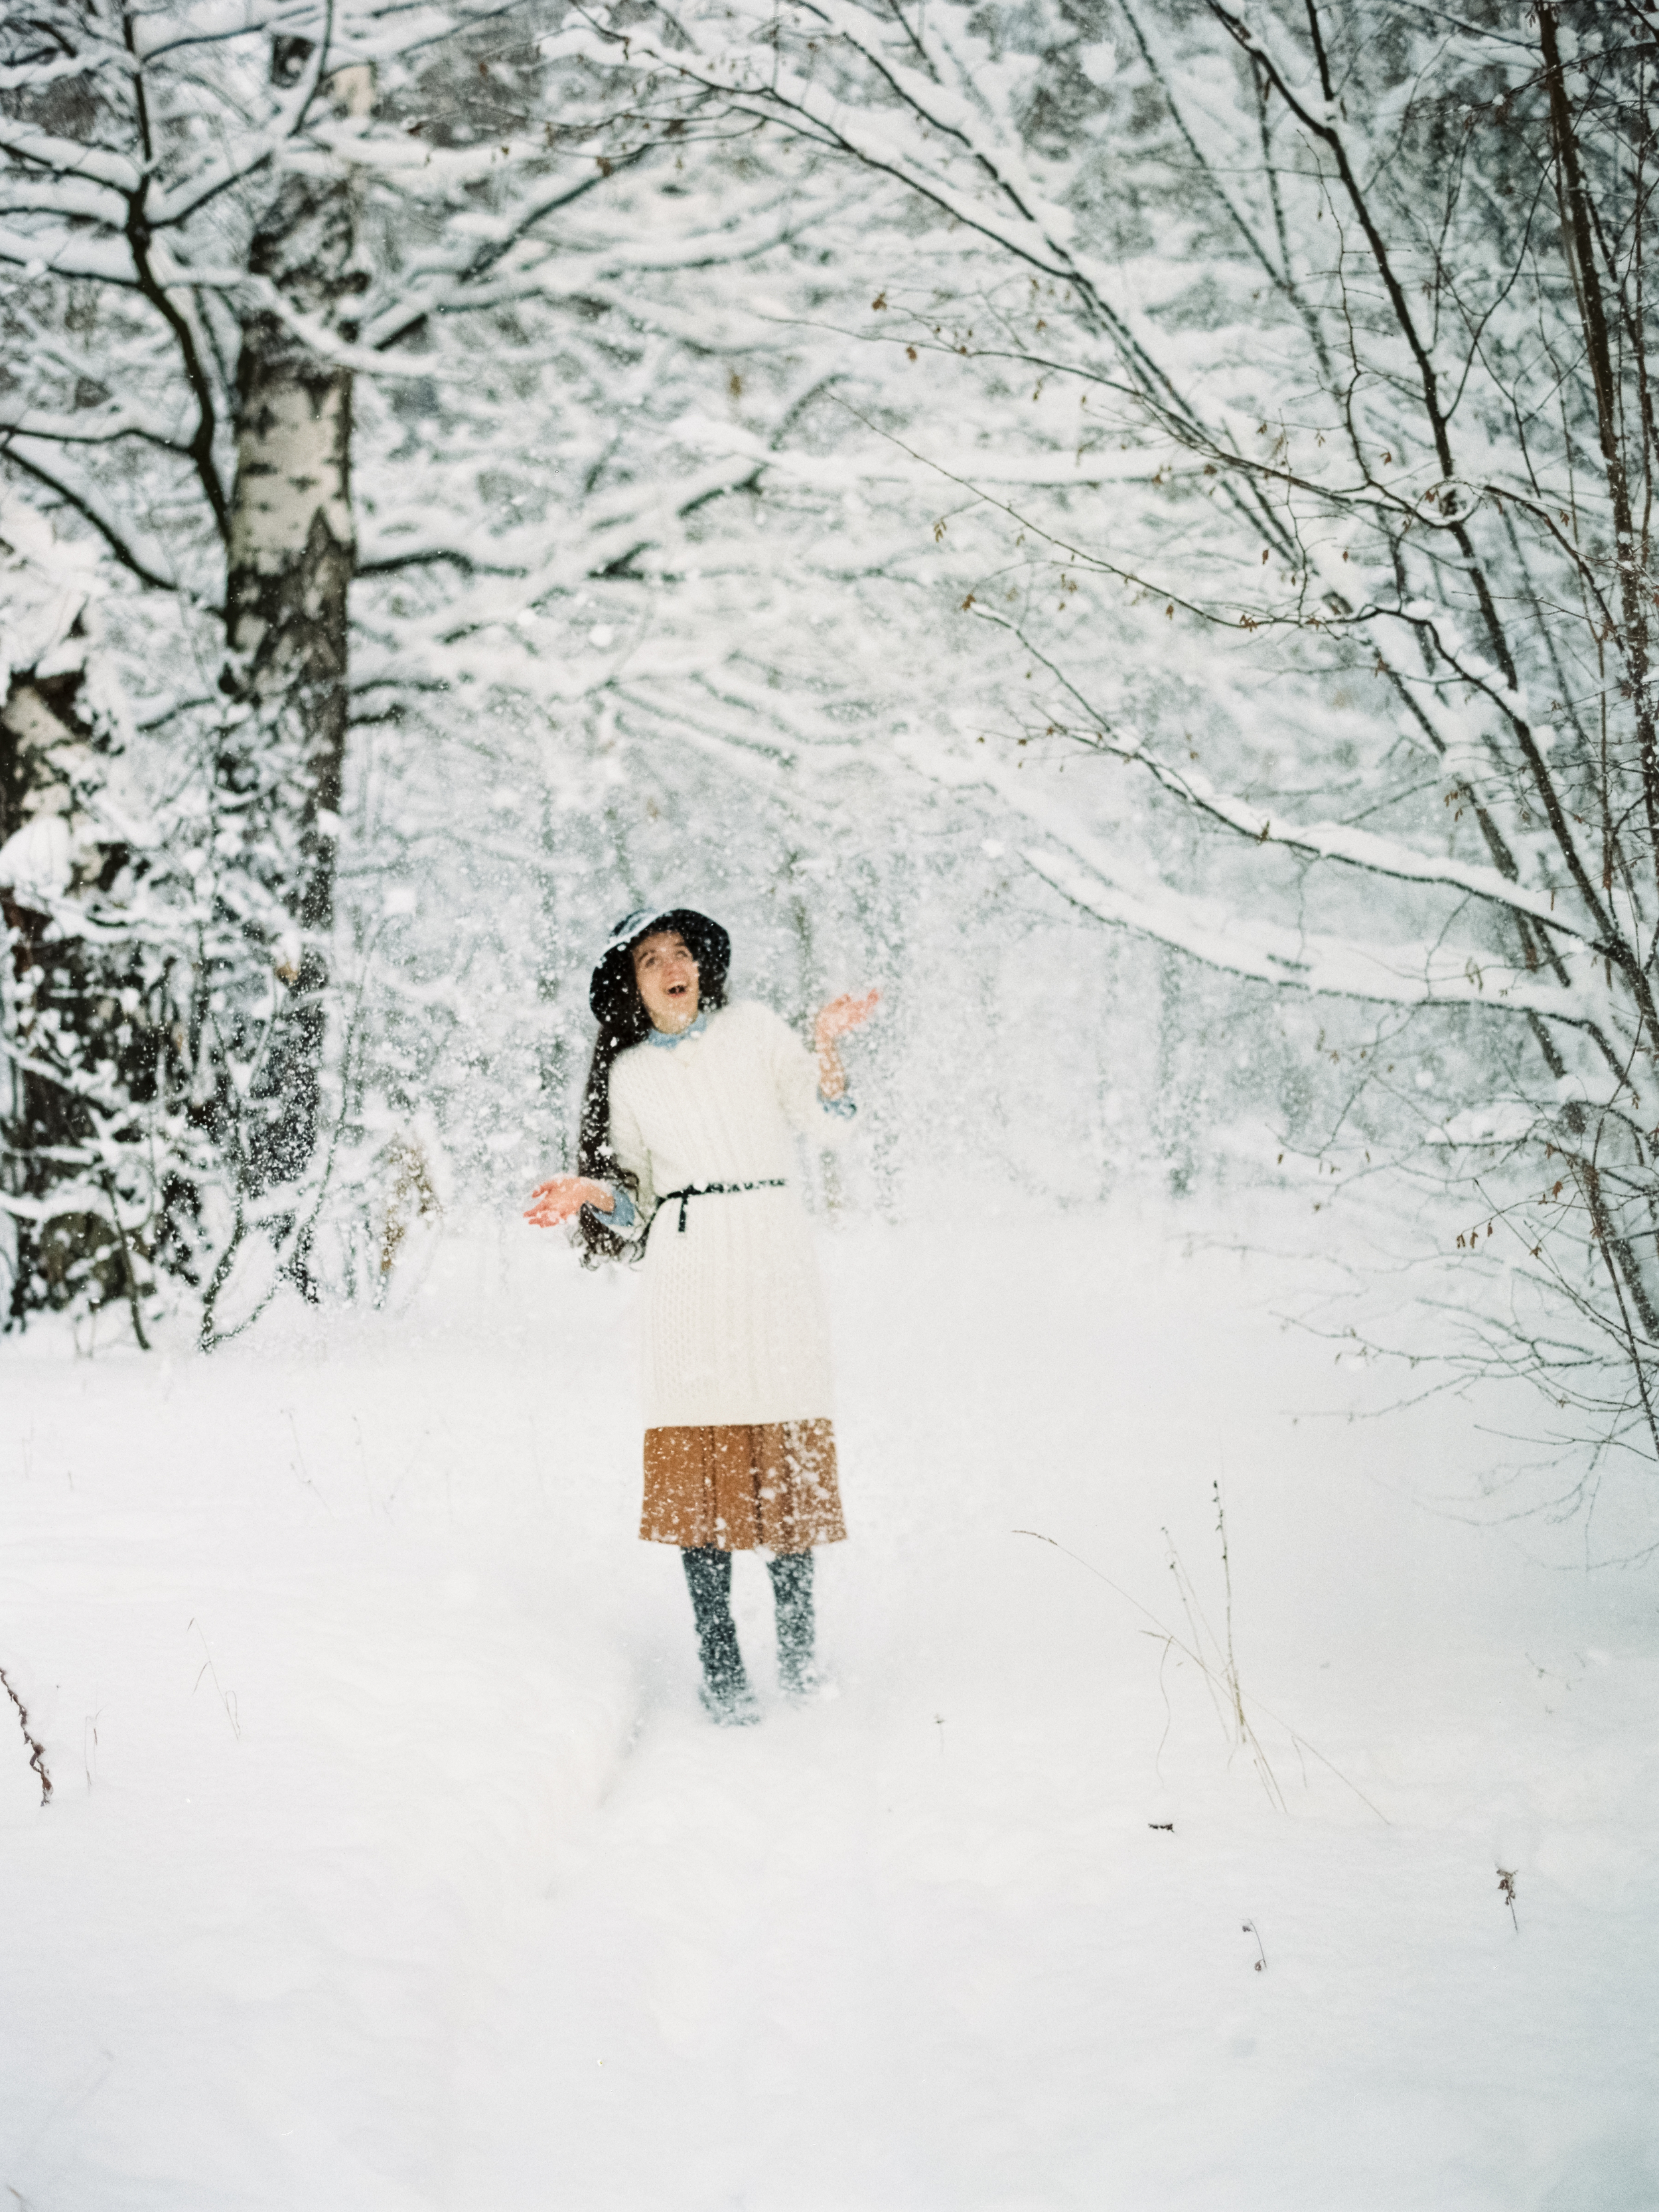 Tamara Gigola Photography winter shoot. Duet Postscriptum. Moscow. Russia. -0005-5.JPG